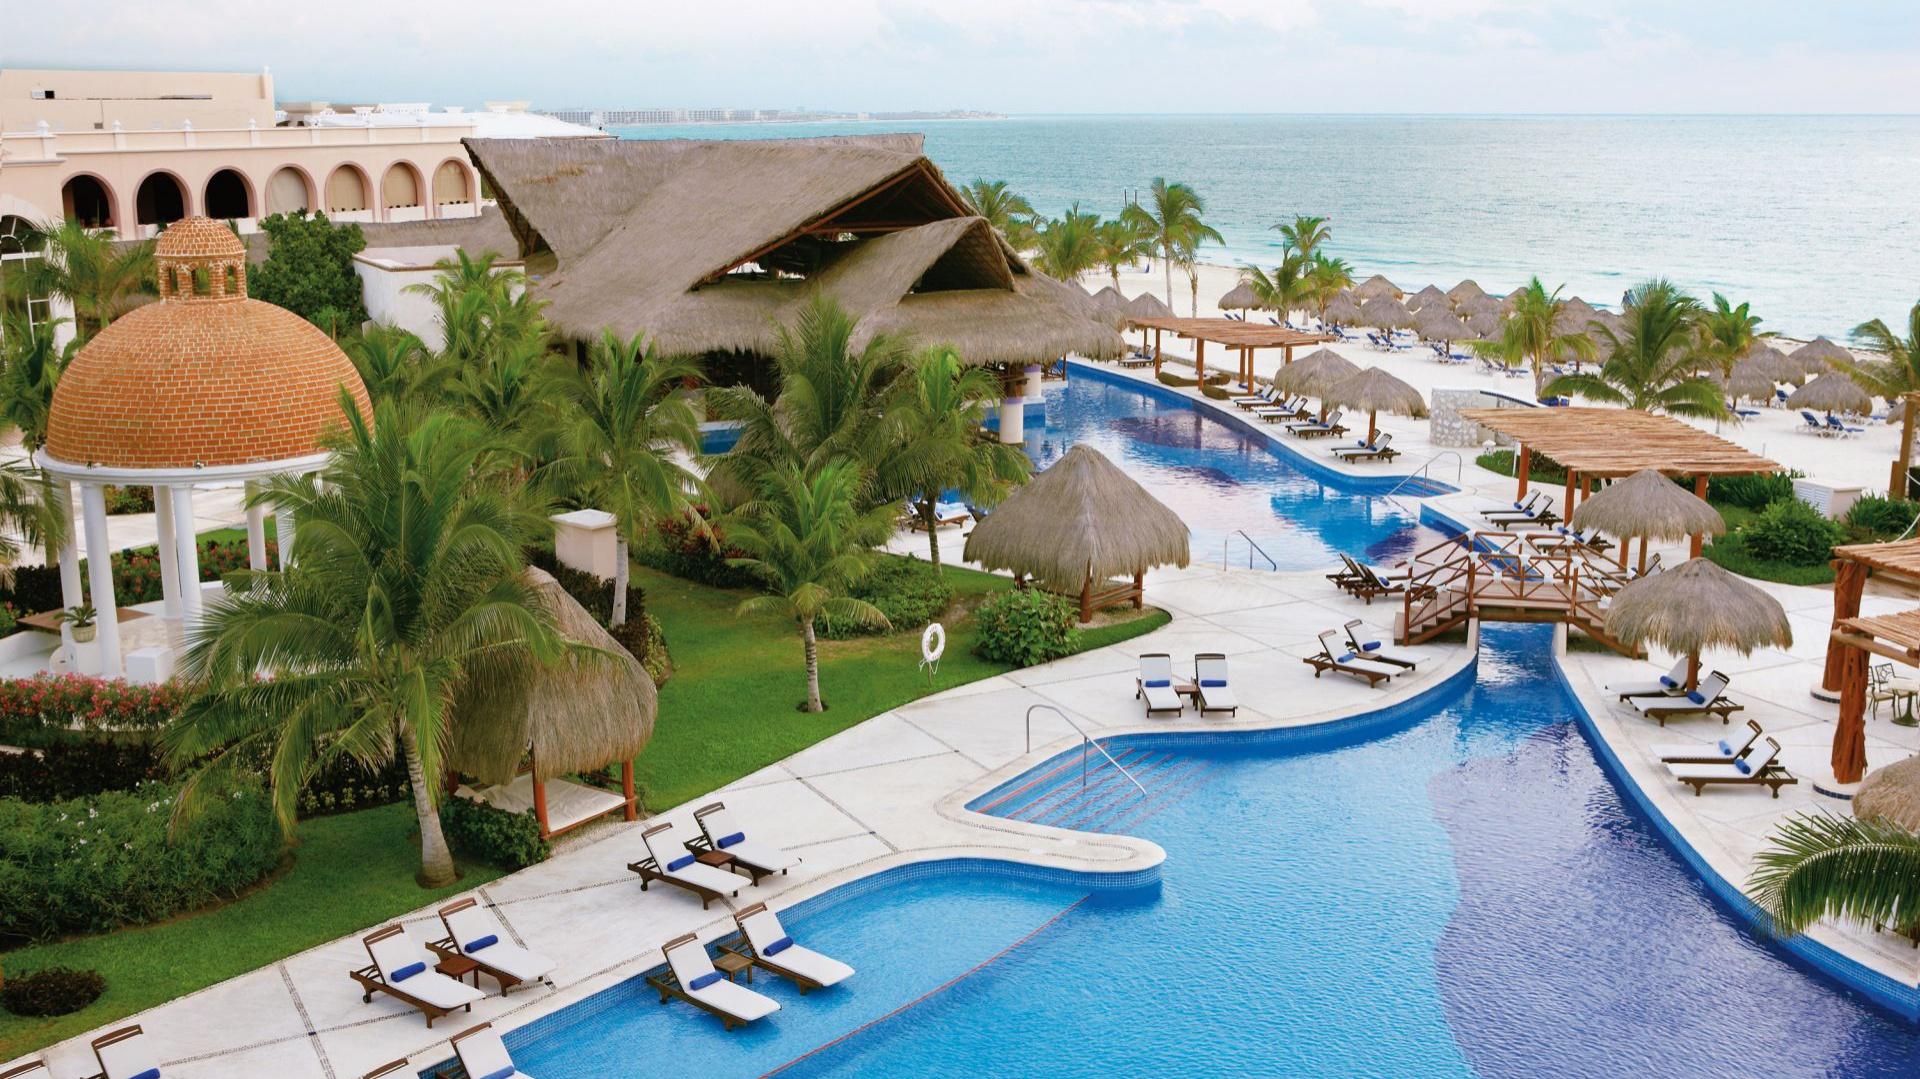 Excellence Riviera Cancun. Meksyk. Fot. Hotels.com